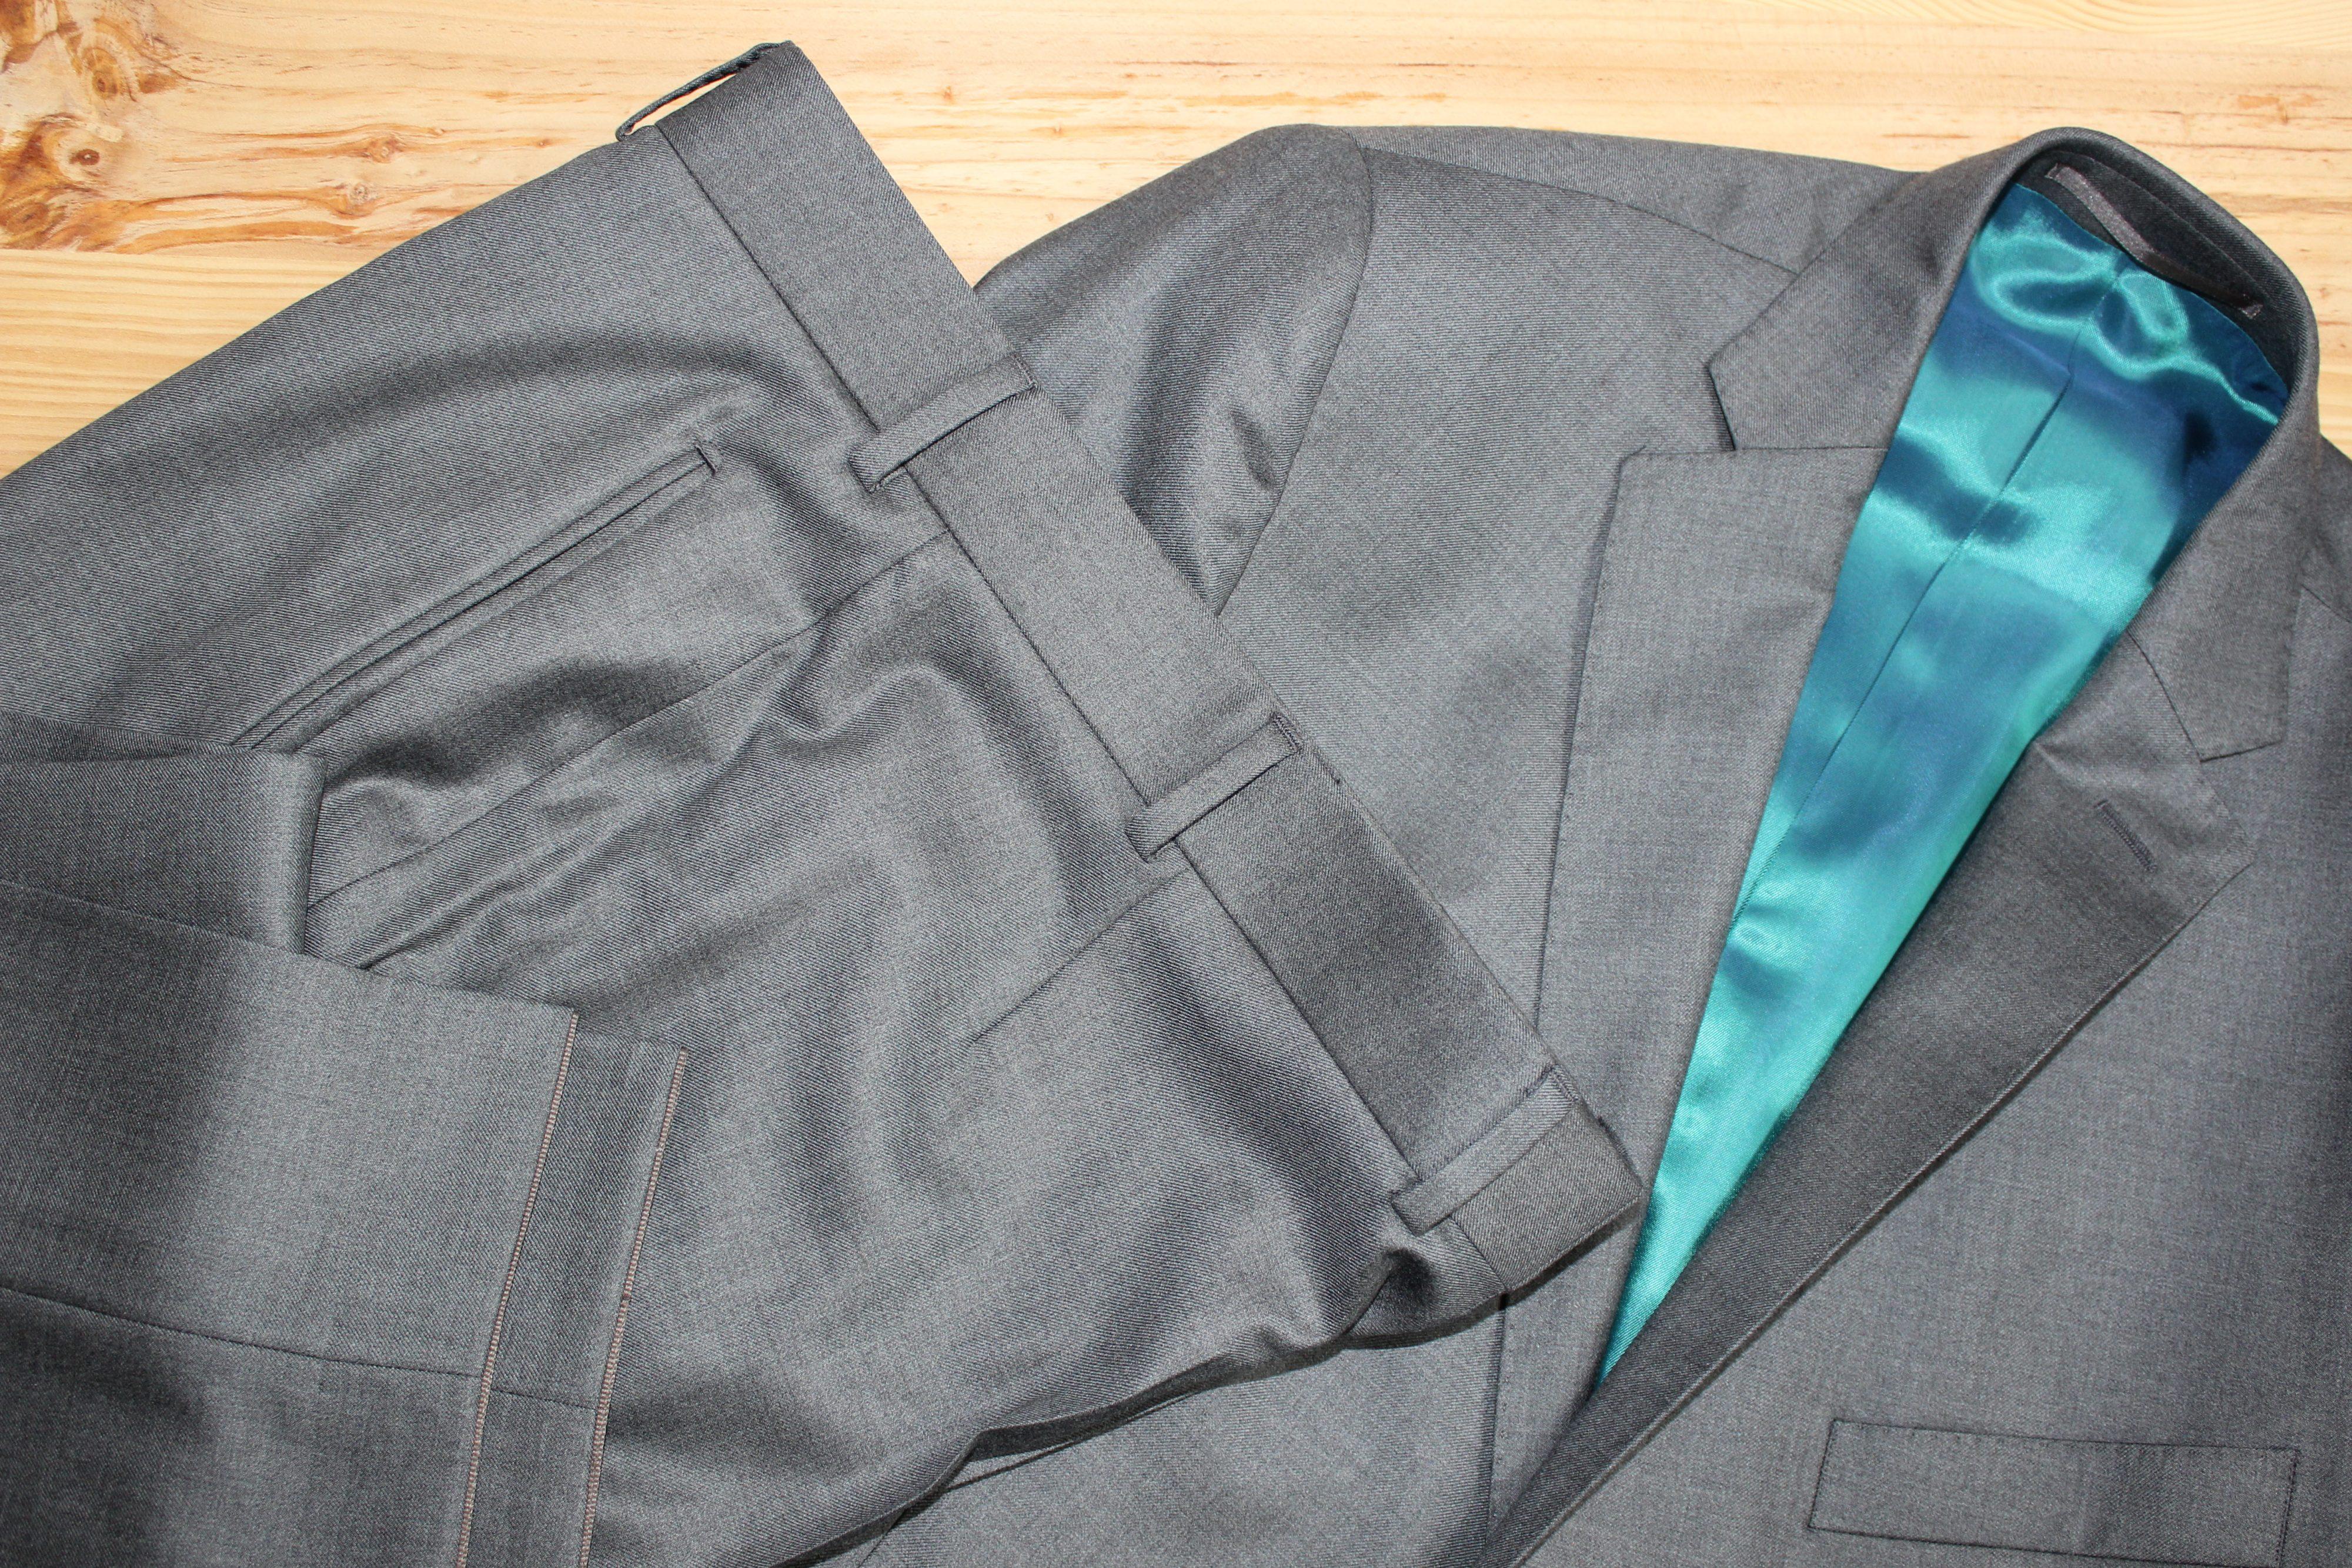 costume gris sur mesure , costume gris , costume sur mesure